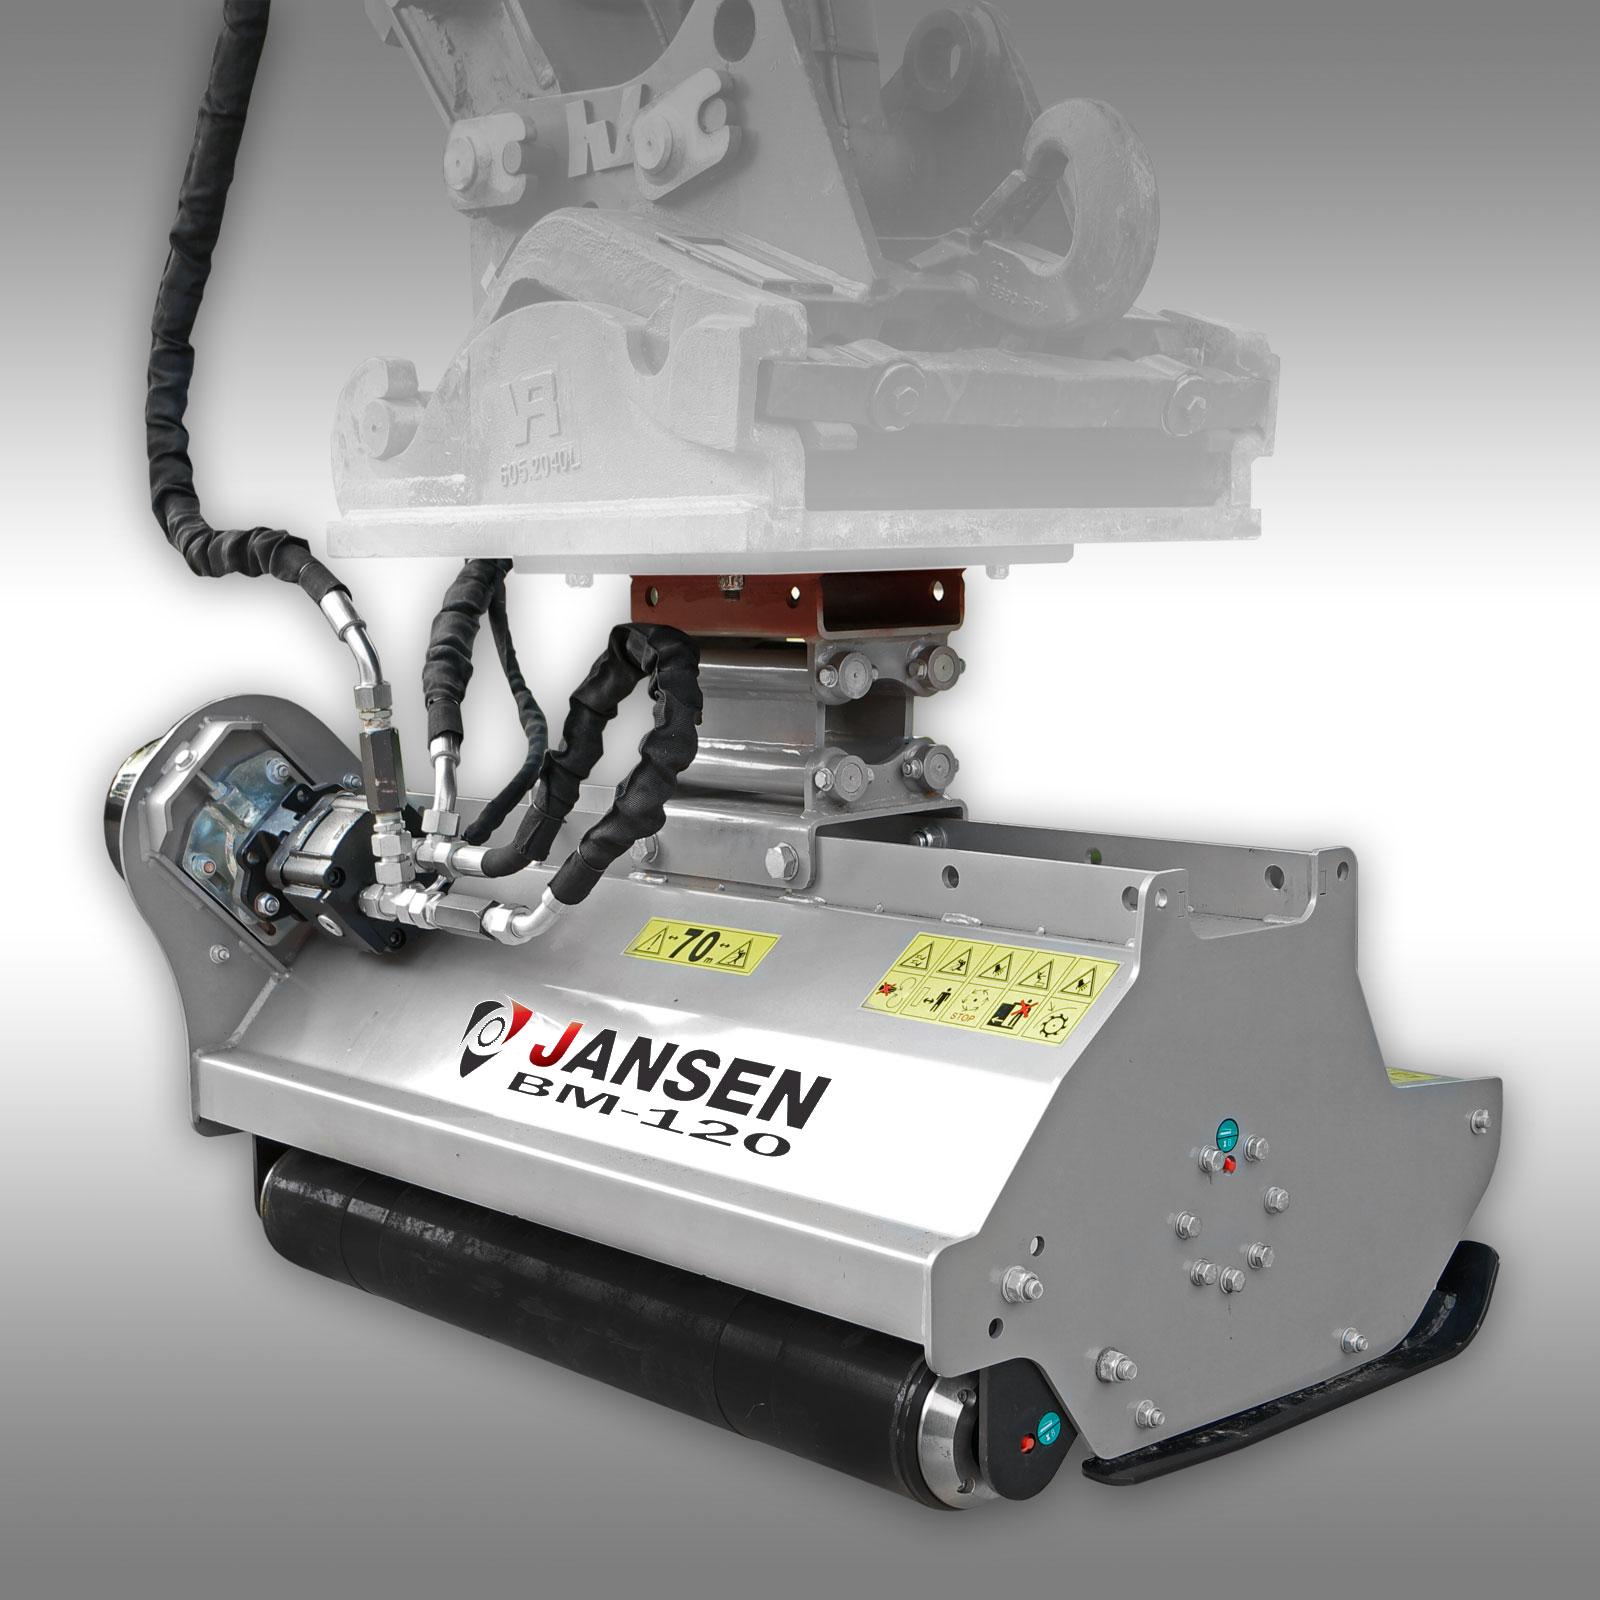 Jansen Klepelmaaier BM-120, hydraulisch, (mini)kraan, klepelmaaier